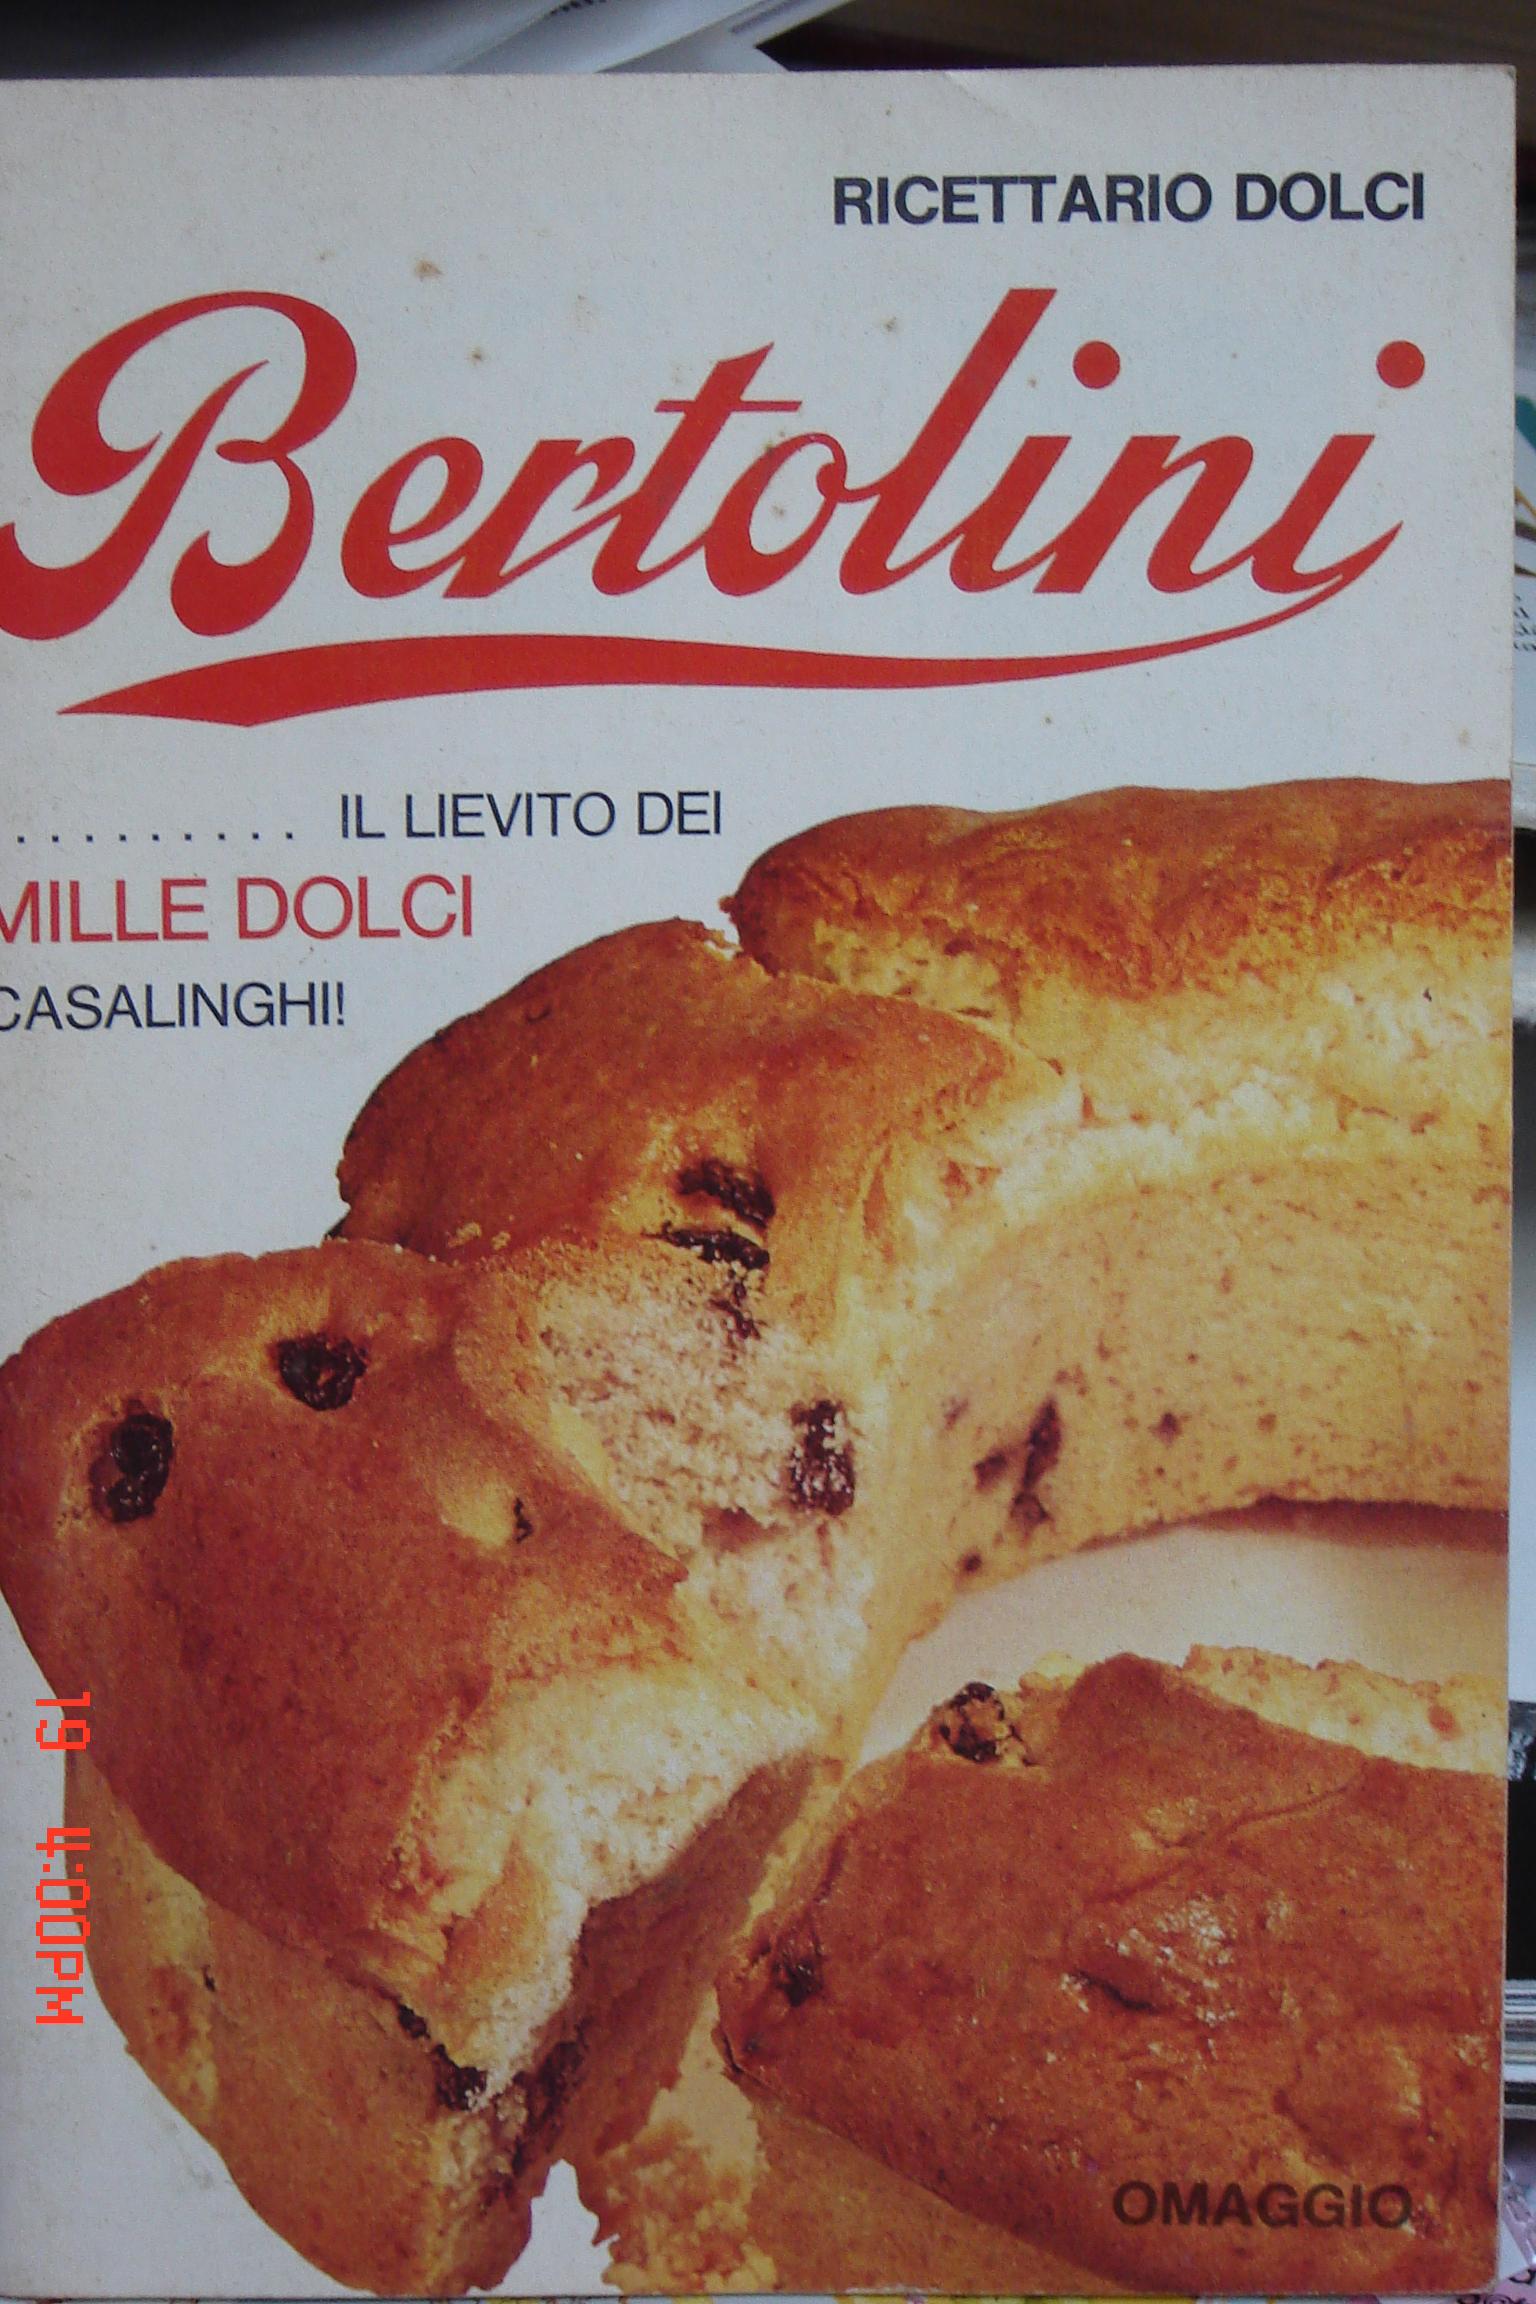 Ricettario dolci Bertolini